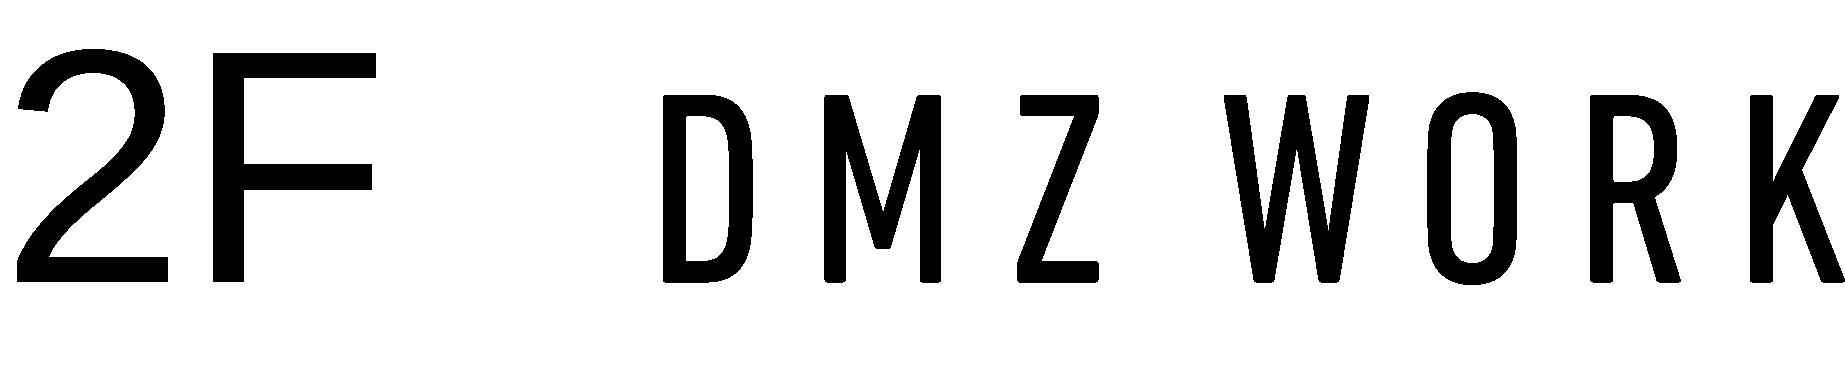 2F DMZ WORK.png